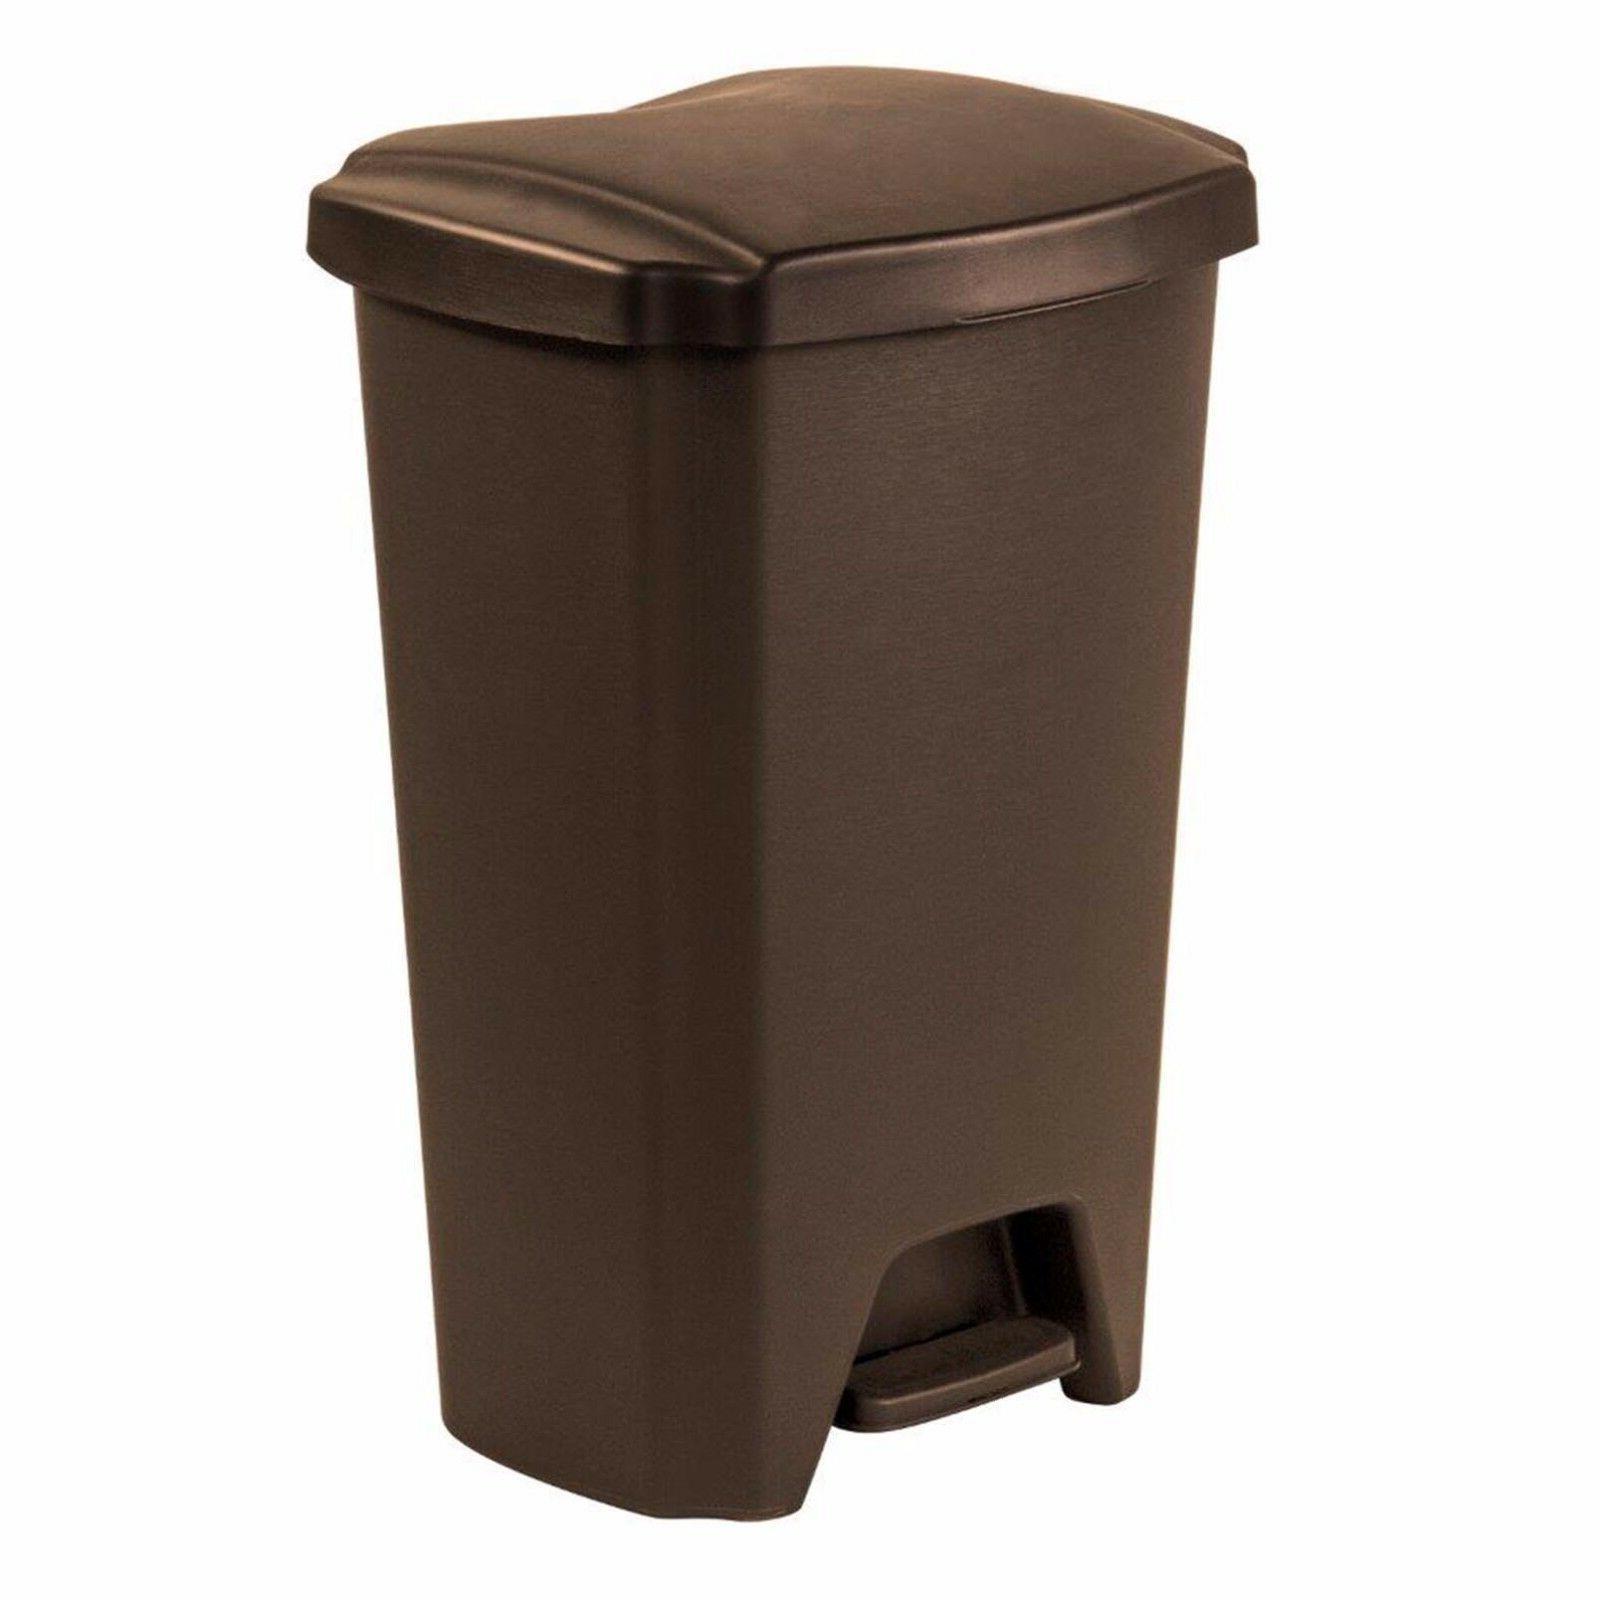 Plastic Bin 13 Gallon Trash Kitchen Basket